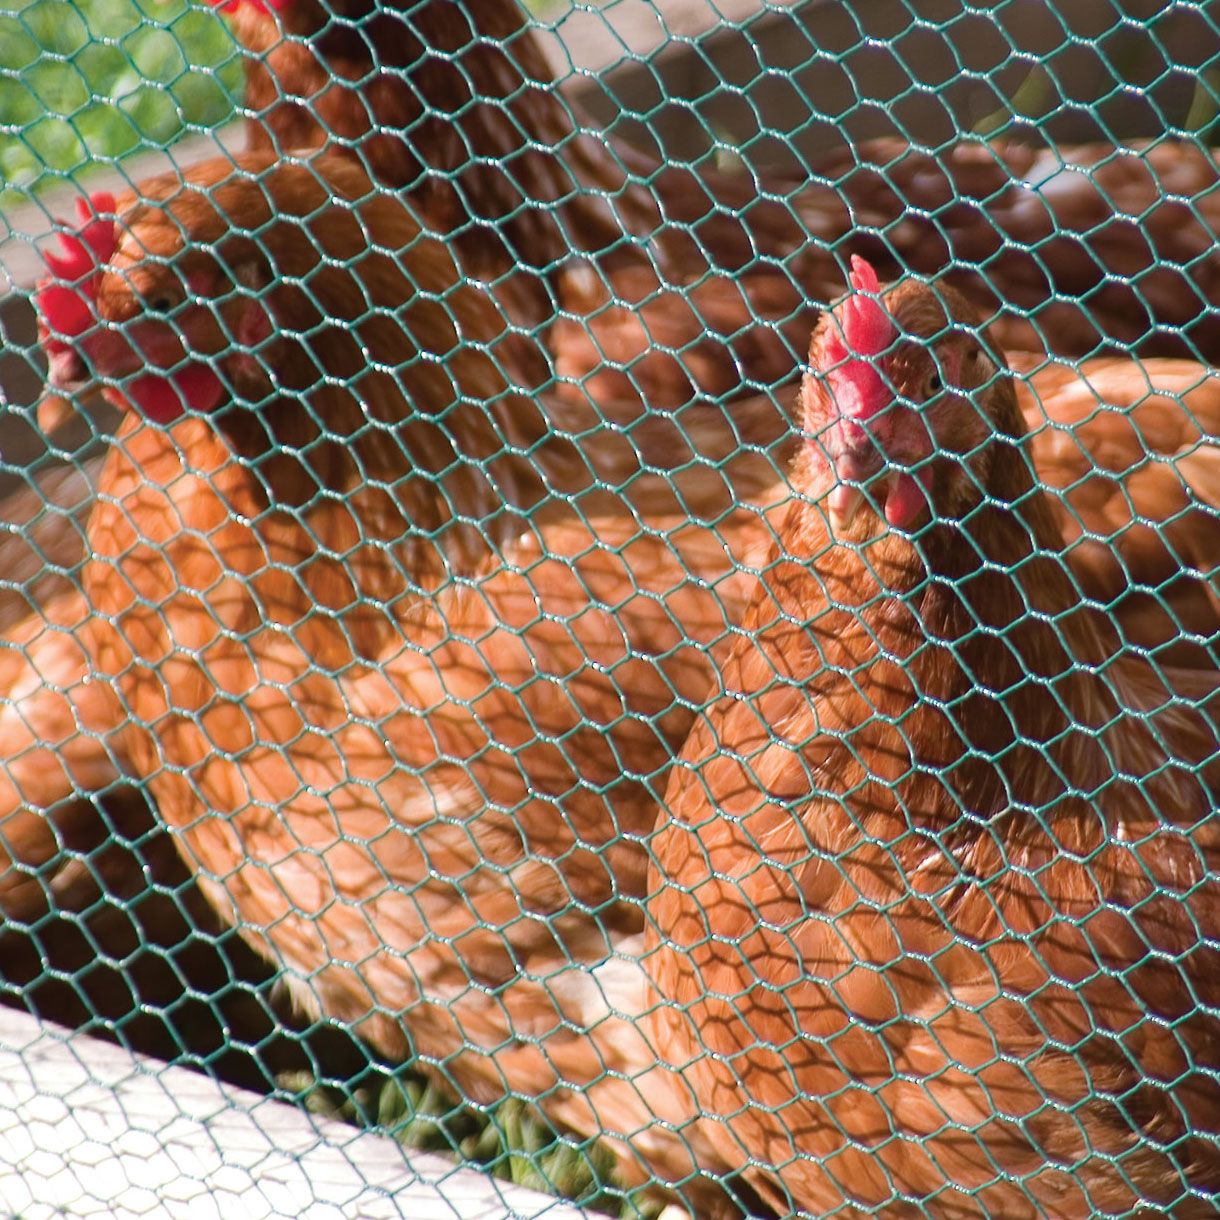 Hexagonal Wire Mesh Netting/Chicken Mesh: Applications 1. Used in ...